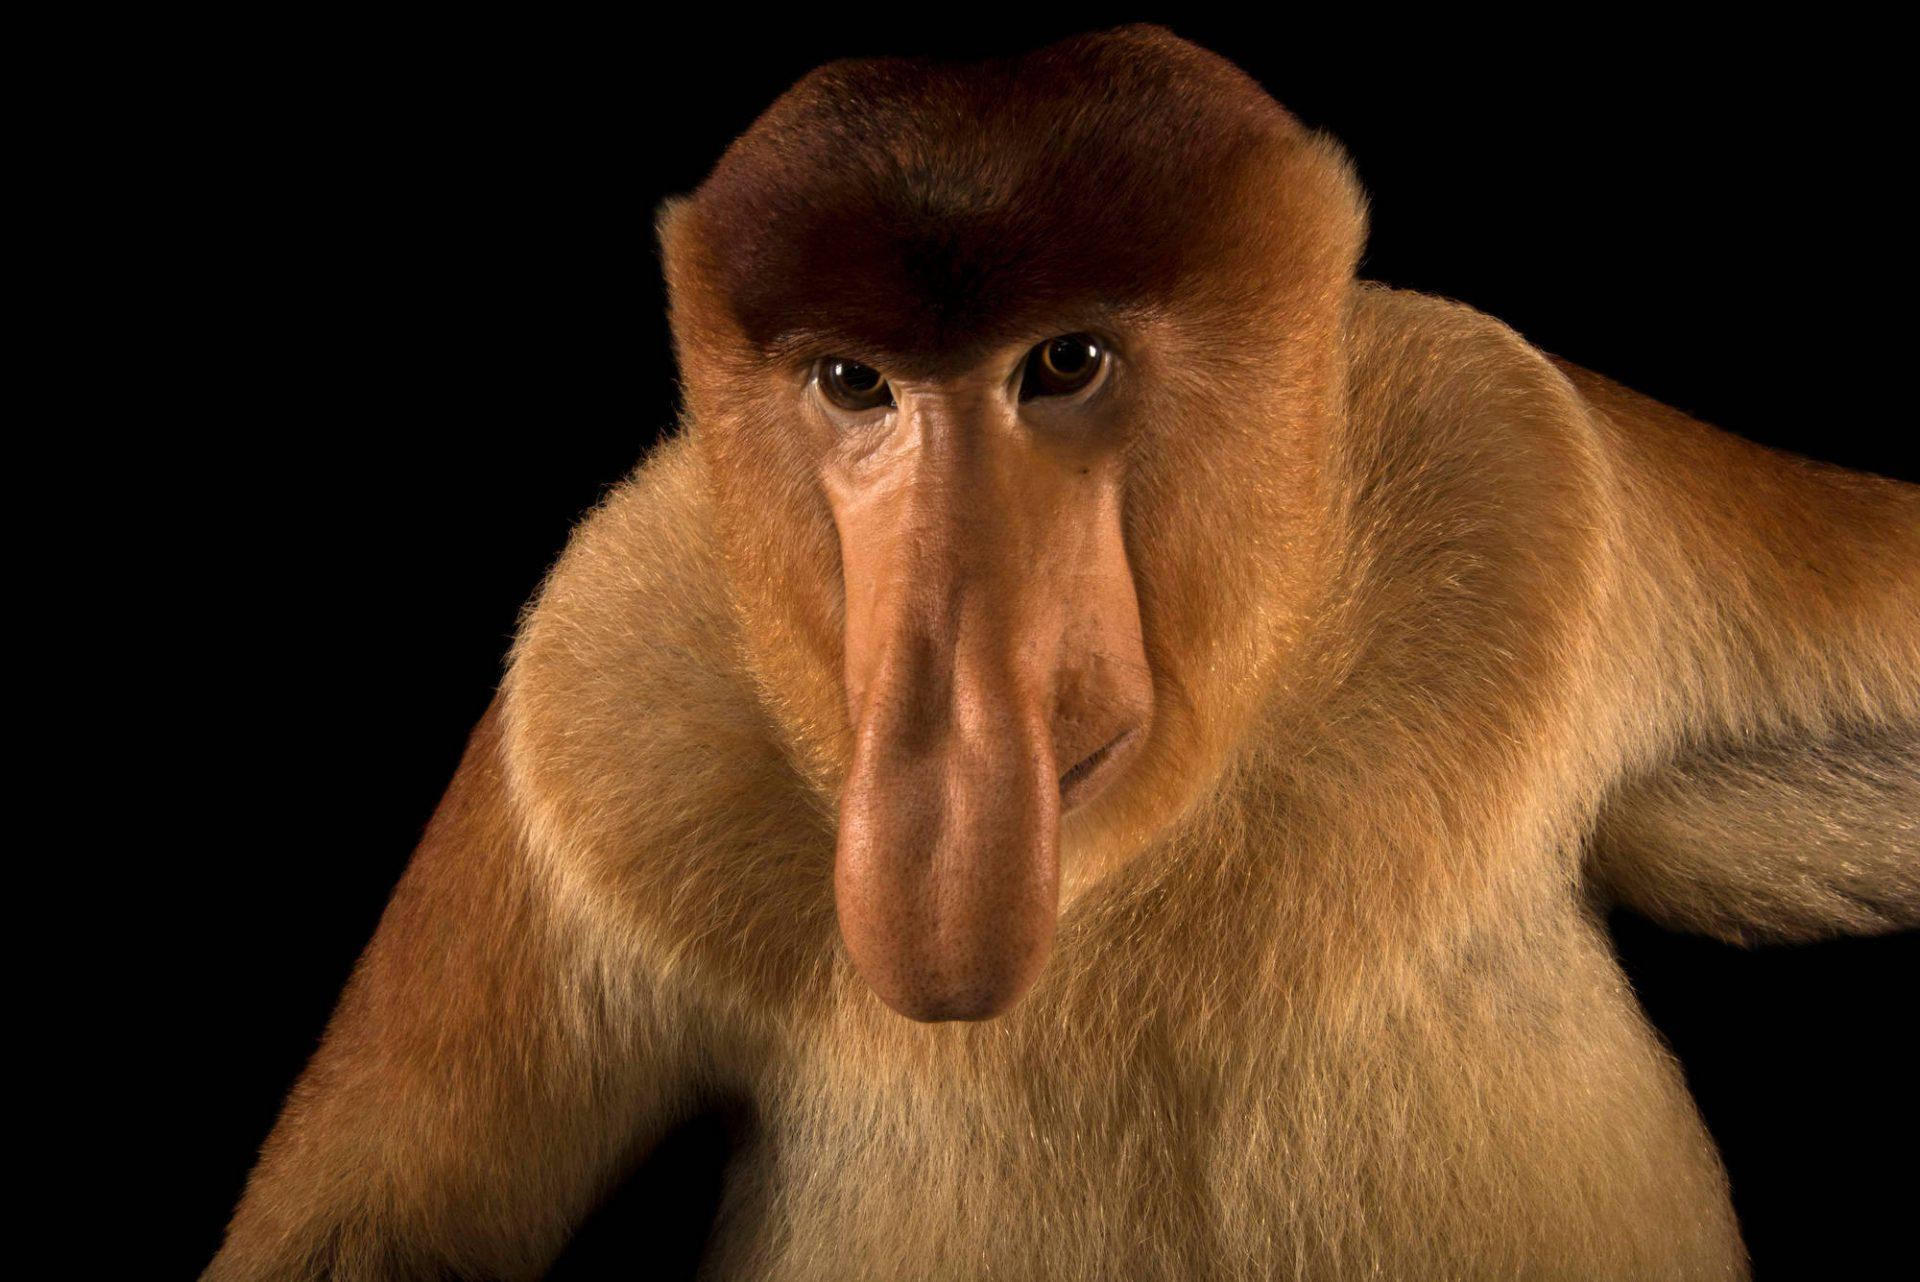 картинки обезьян с длинным носом миску ломтик ржаного